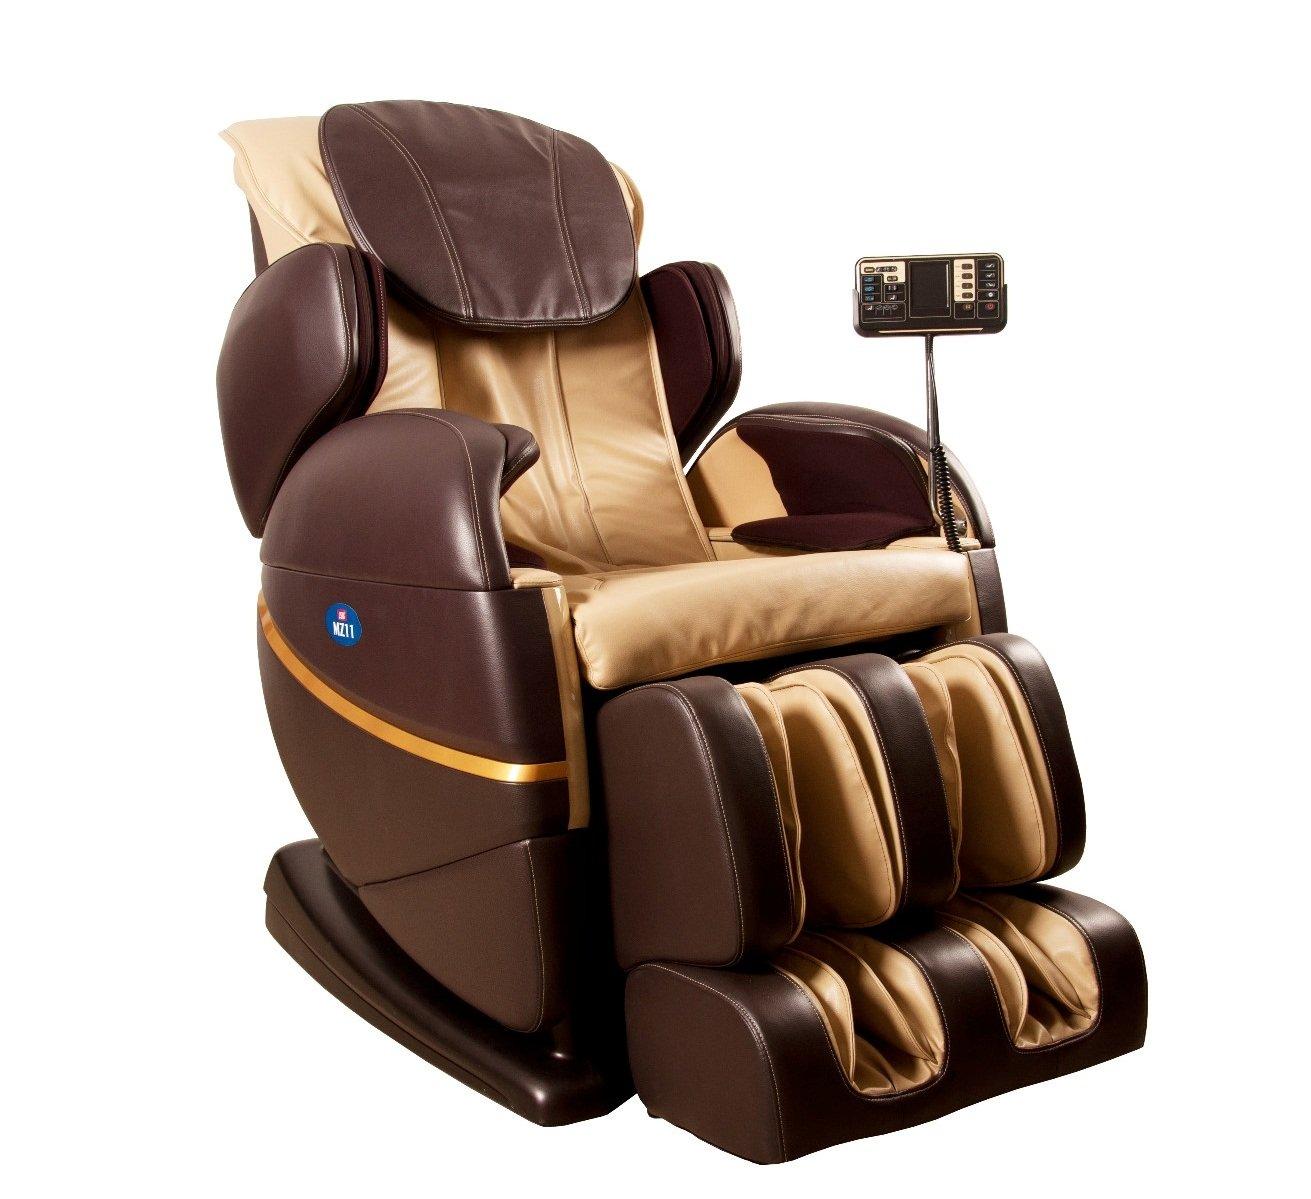 SB MZ11 Zero Gravity Massage Chair